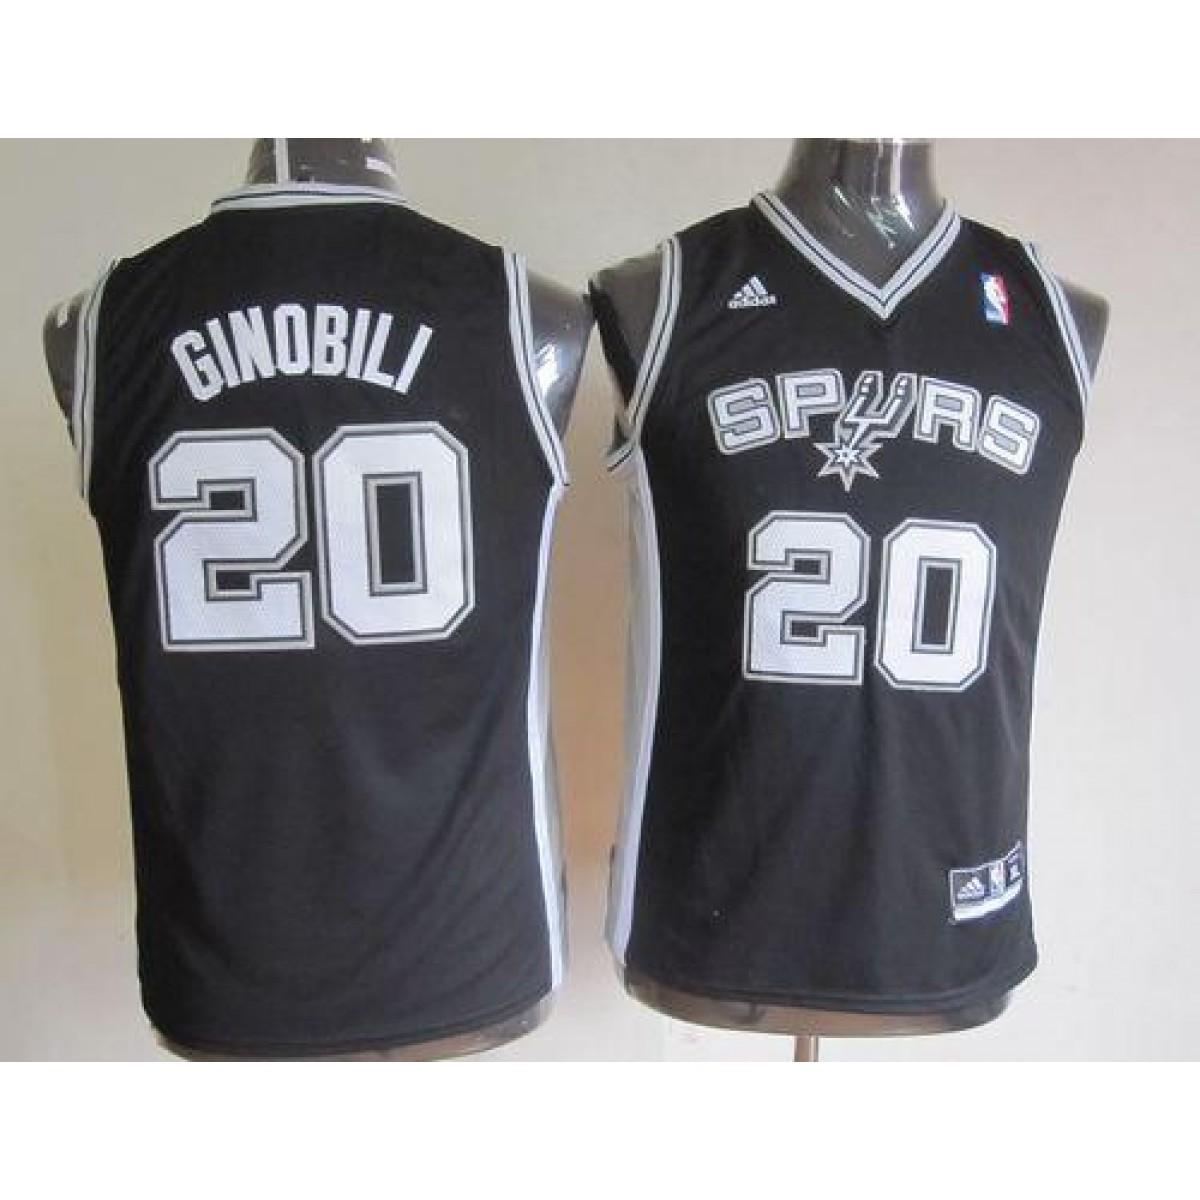 on sale 6b739 cc524 NBA Spurs 20 Manu Ginobili Black Youth Jersey